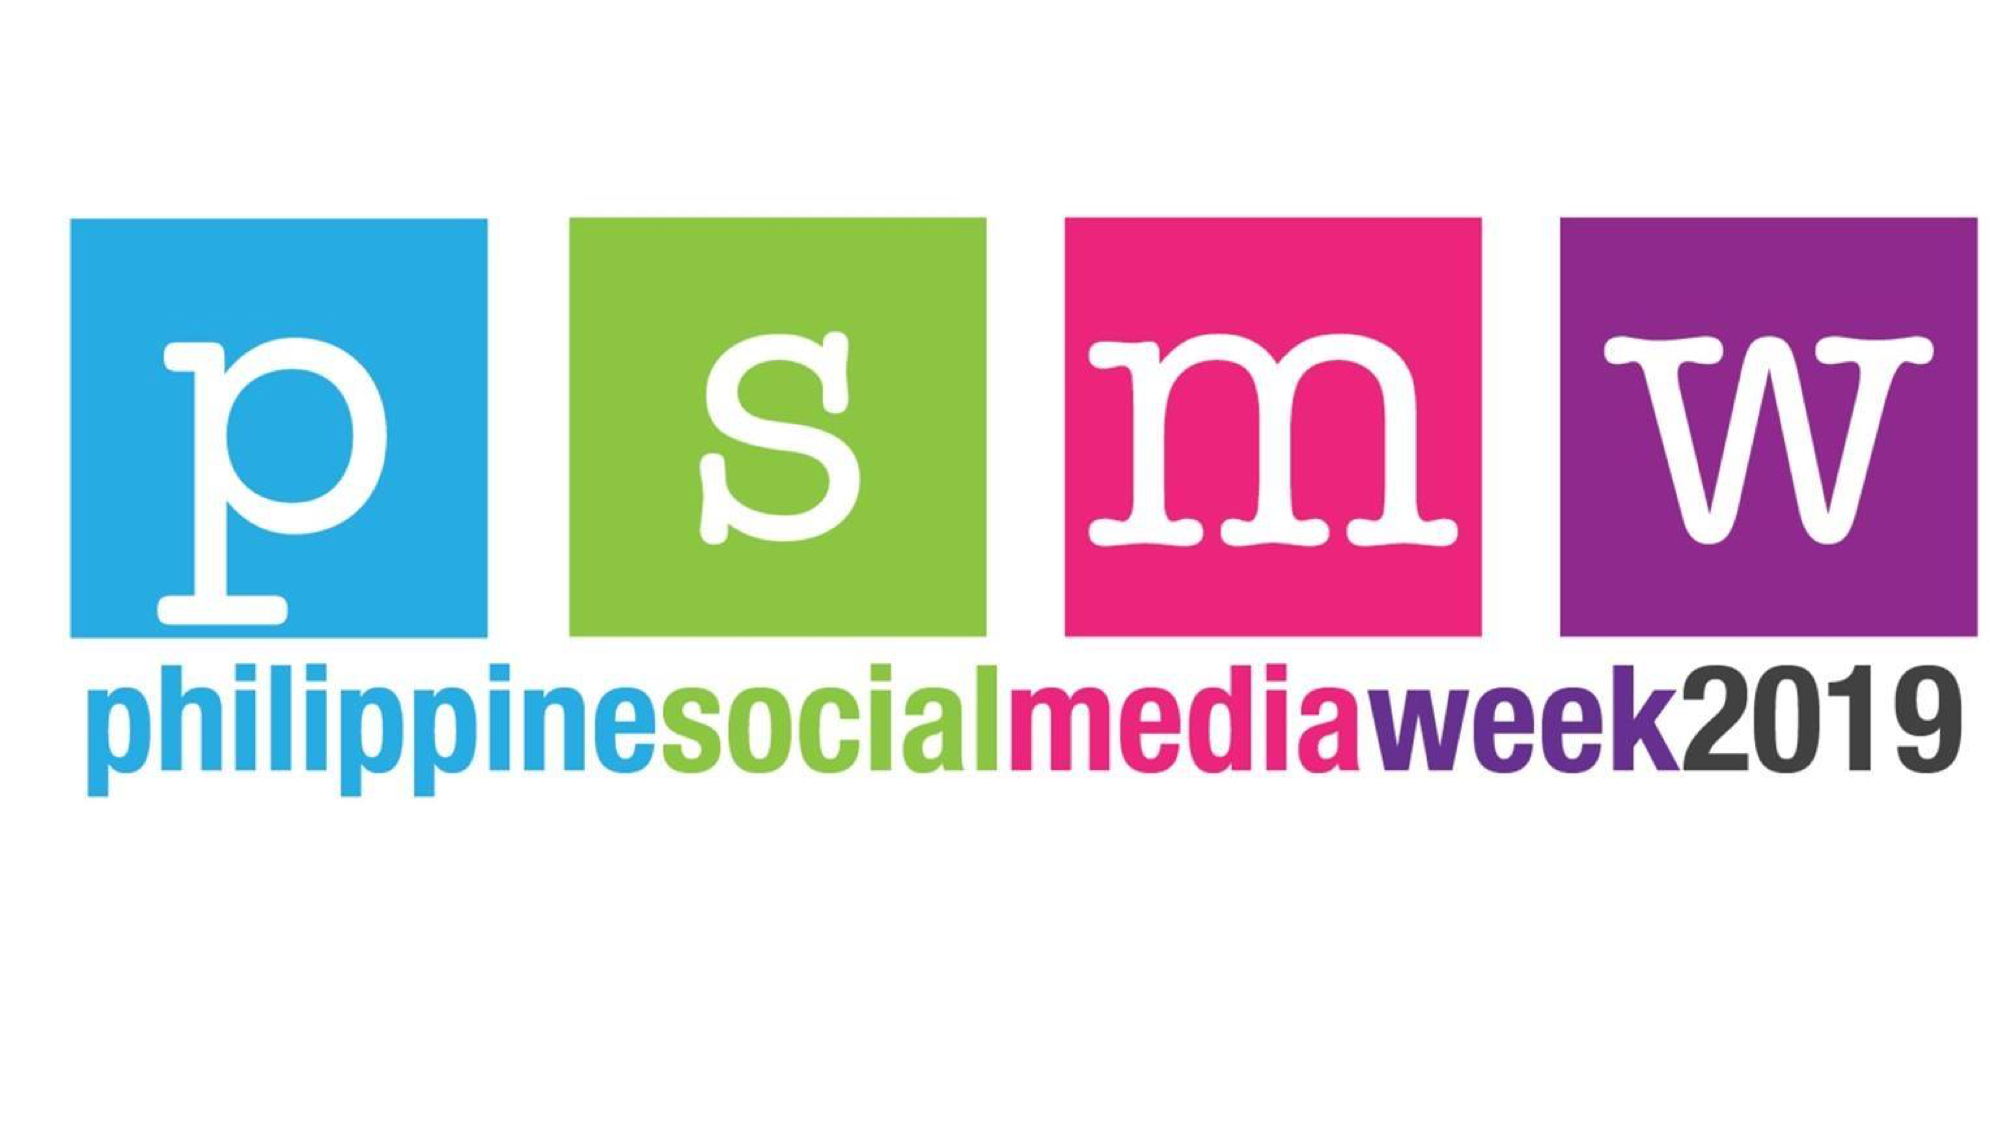 Level Up Your Social Media Skills at Philippine Social Media